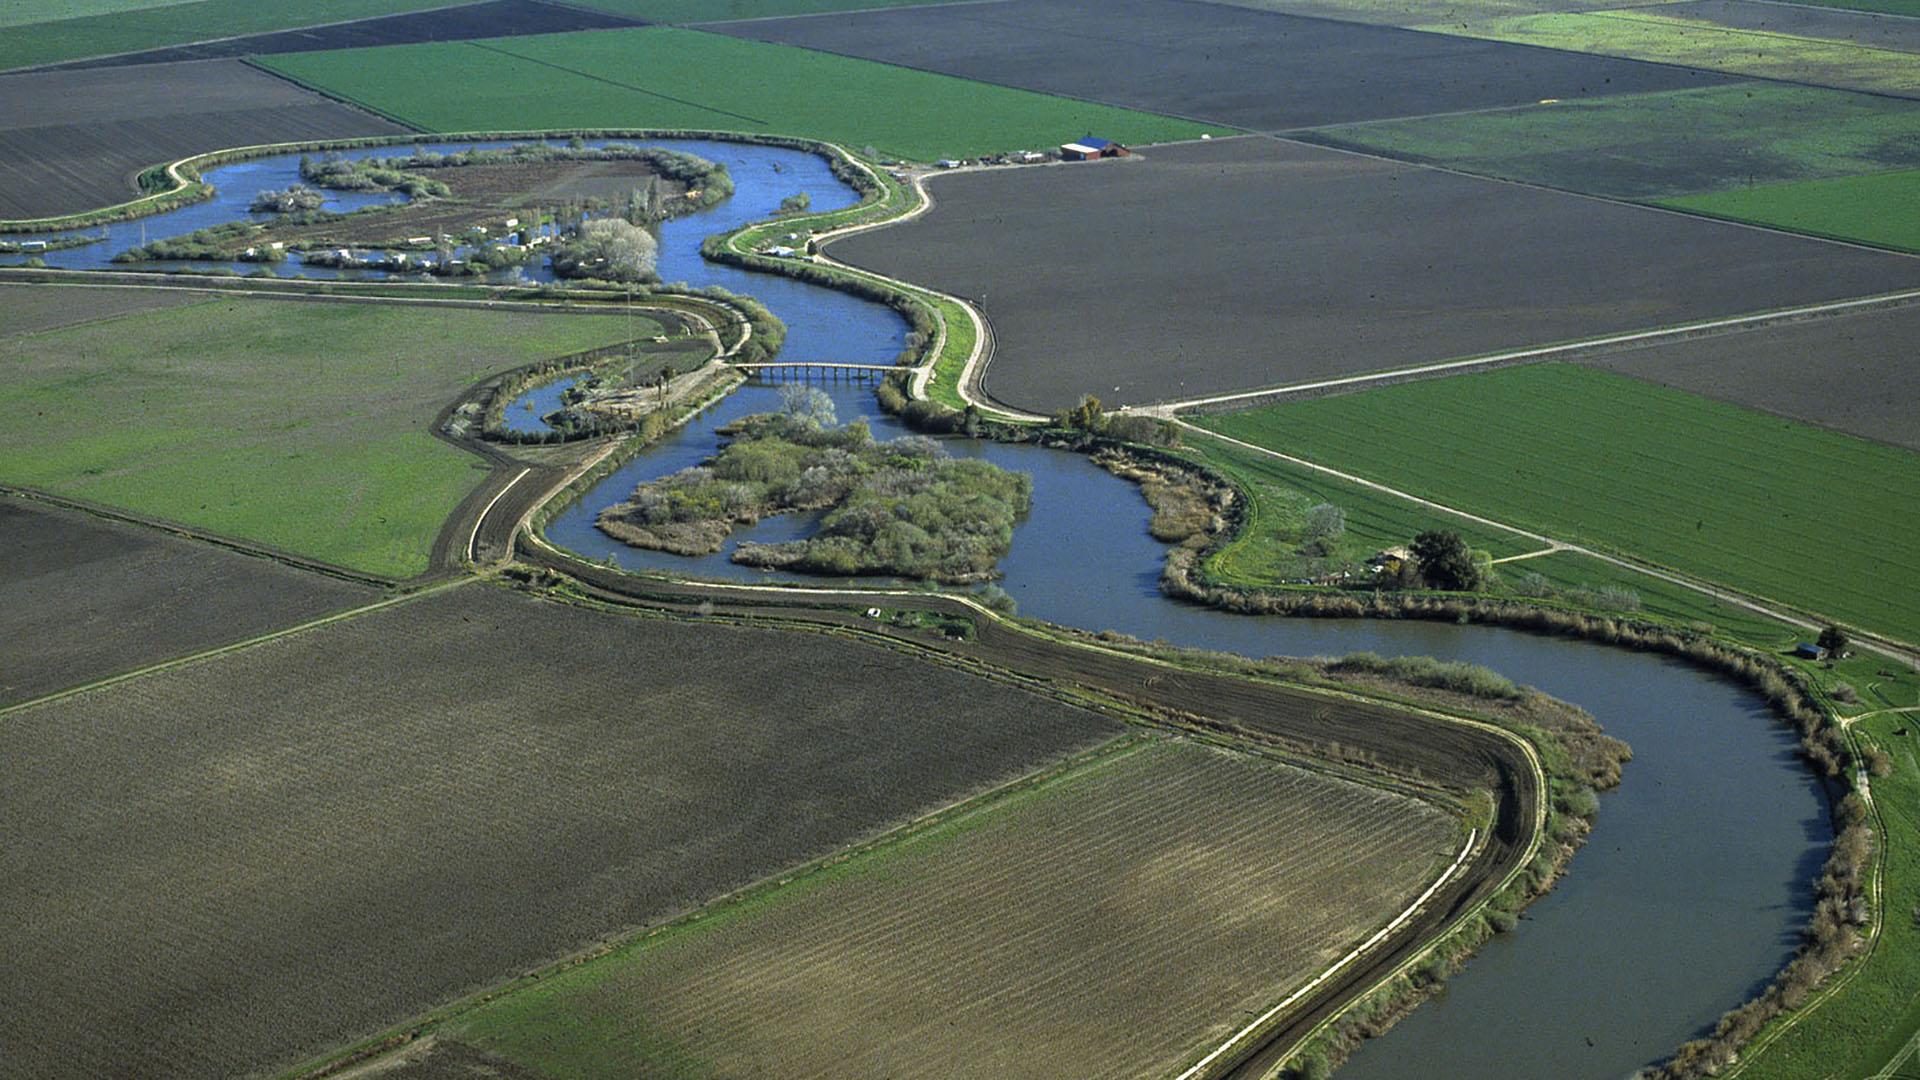 Aerial view of the San Joaquin/Sacramento River delta.